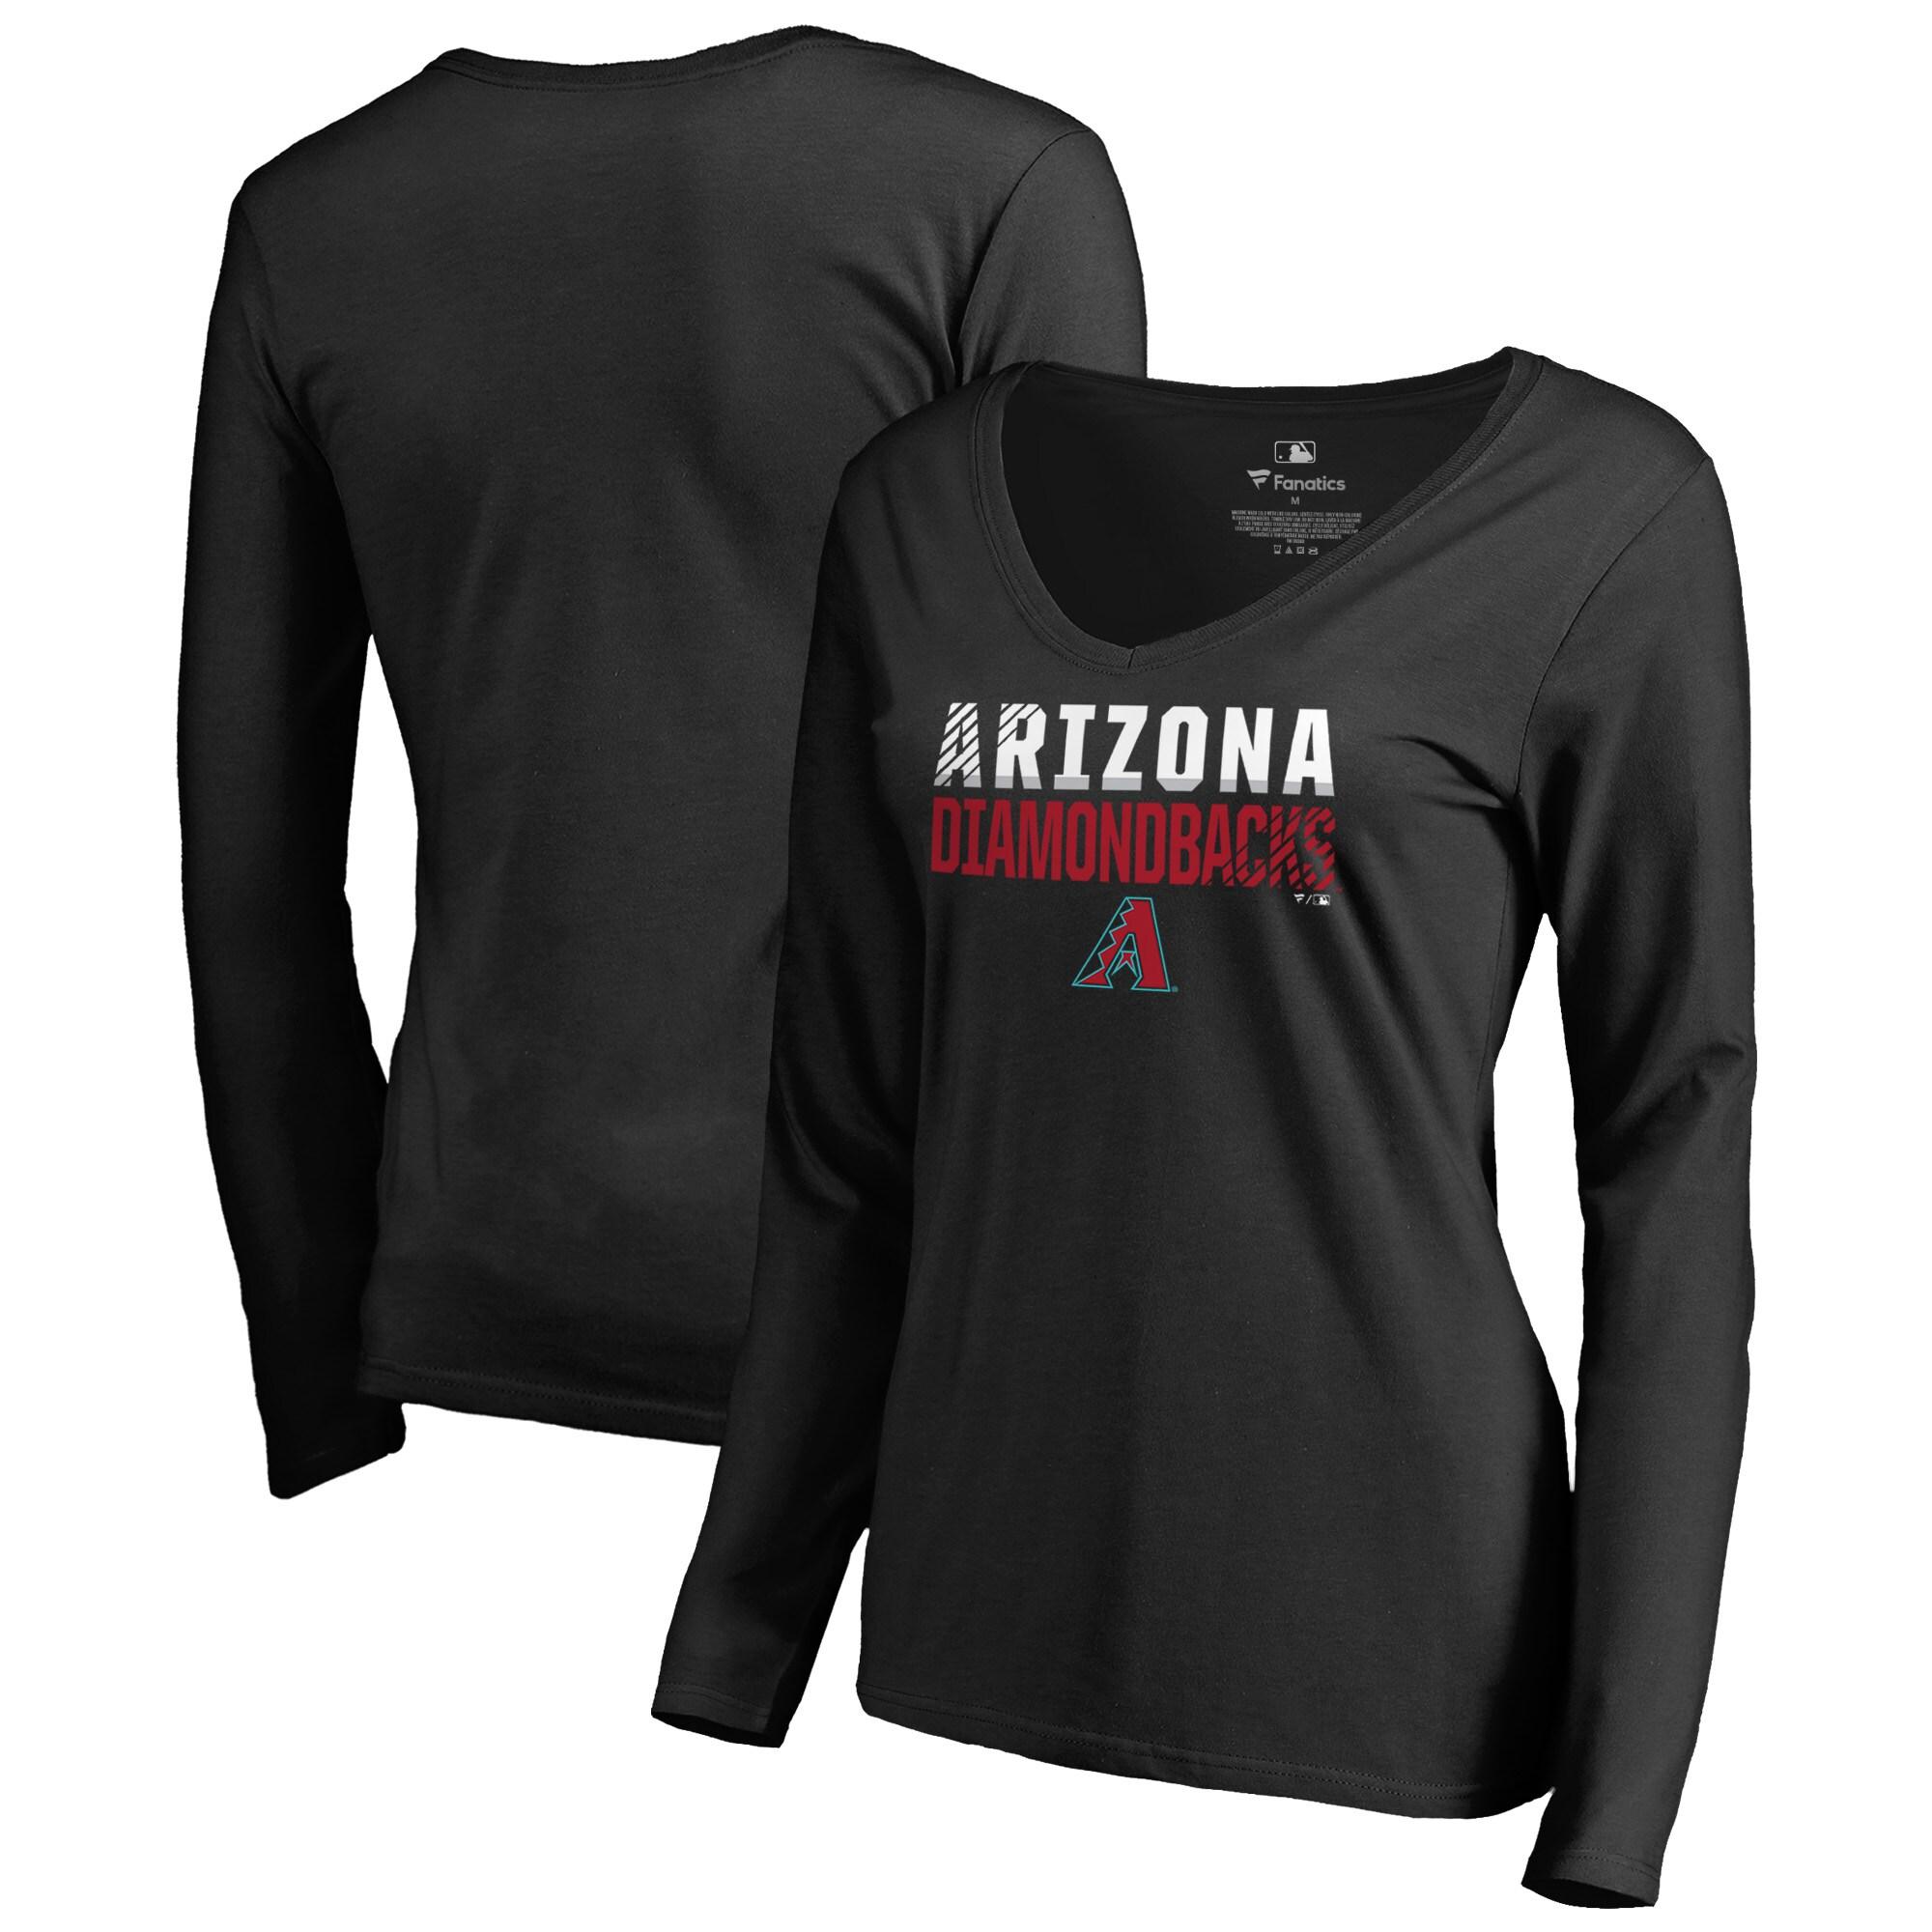 Arizona Diamondbacks Fanatics Branded Women's Fade Out V-Neck Long Sleeve T-Shirt - Black